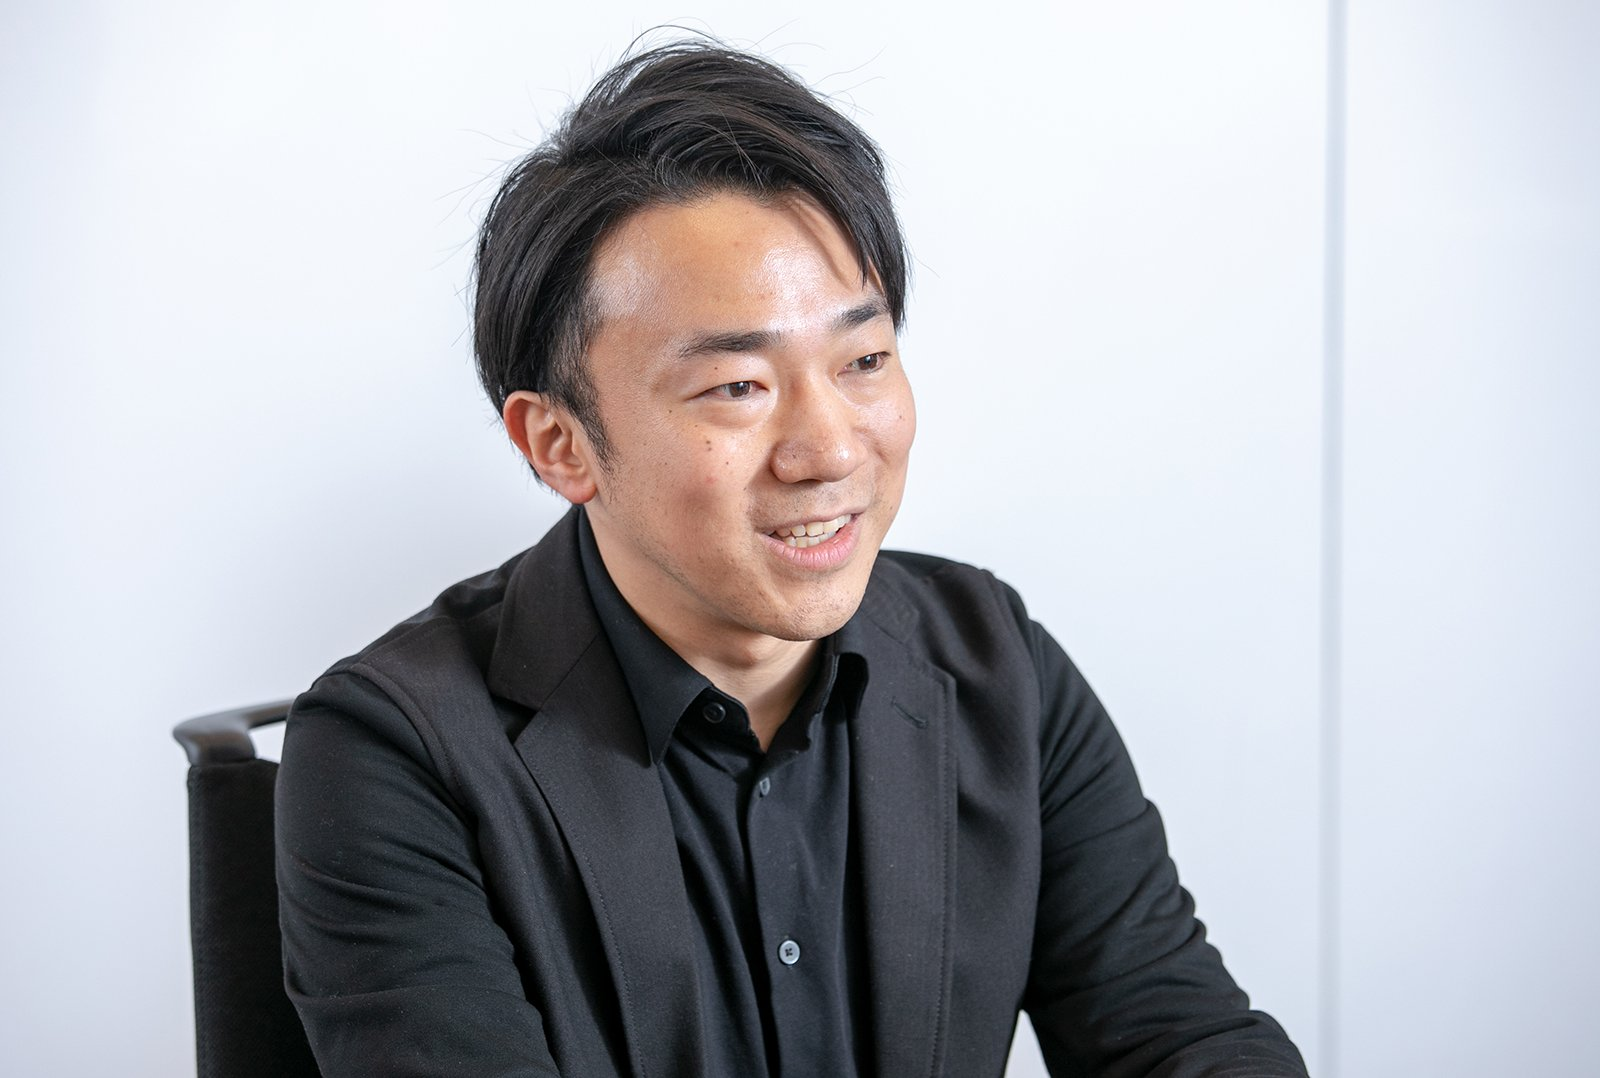 Photo: Ryo Yamada, Industrial Solutions Company, Panasonic Corporation